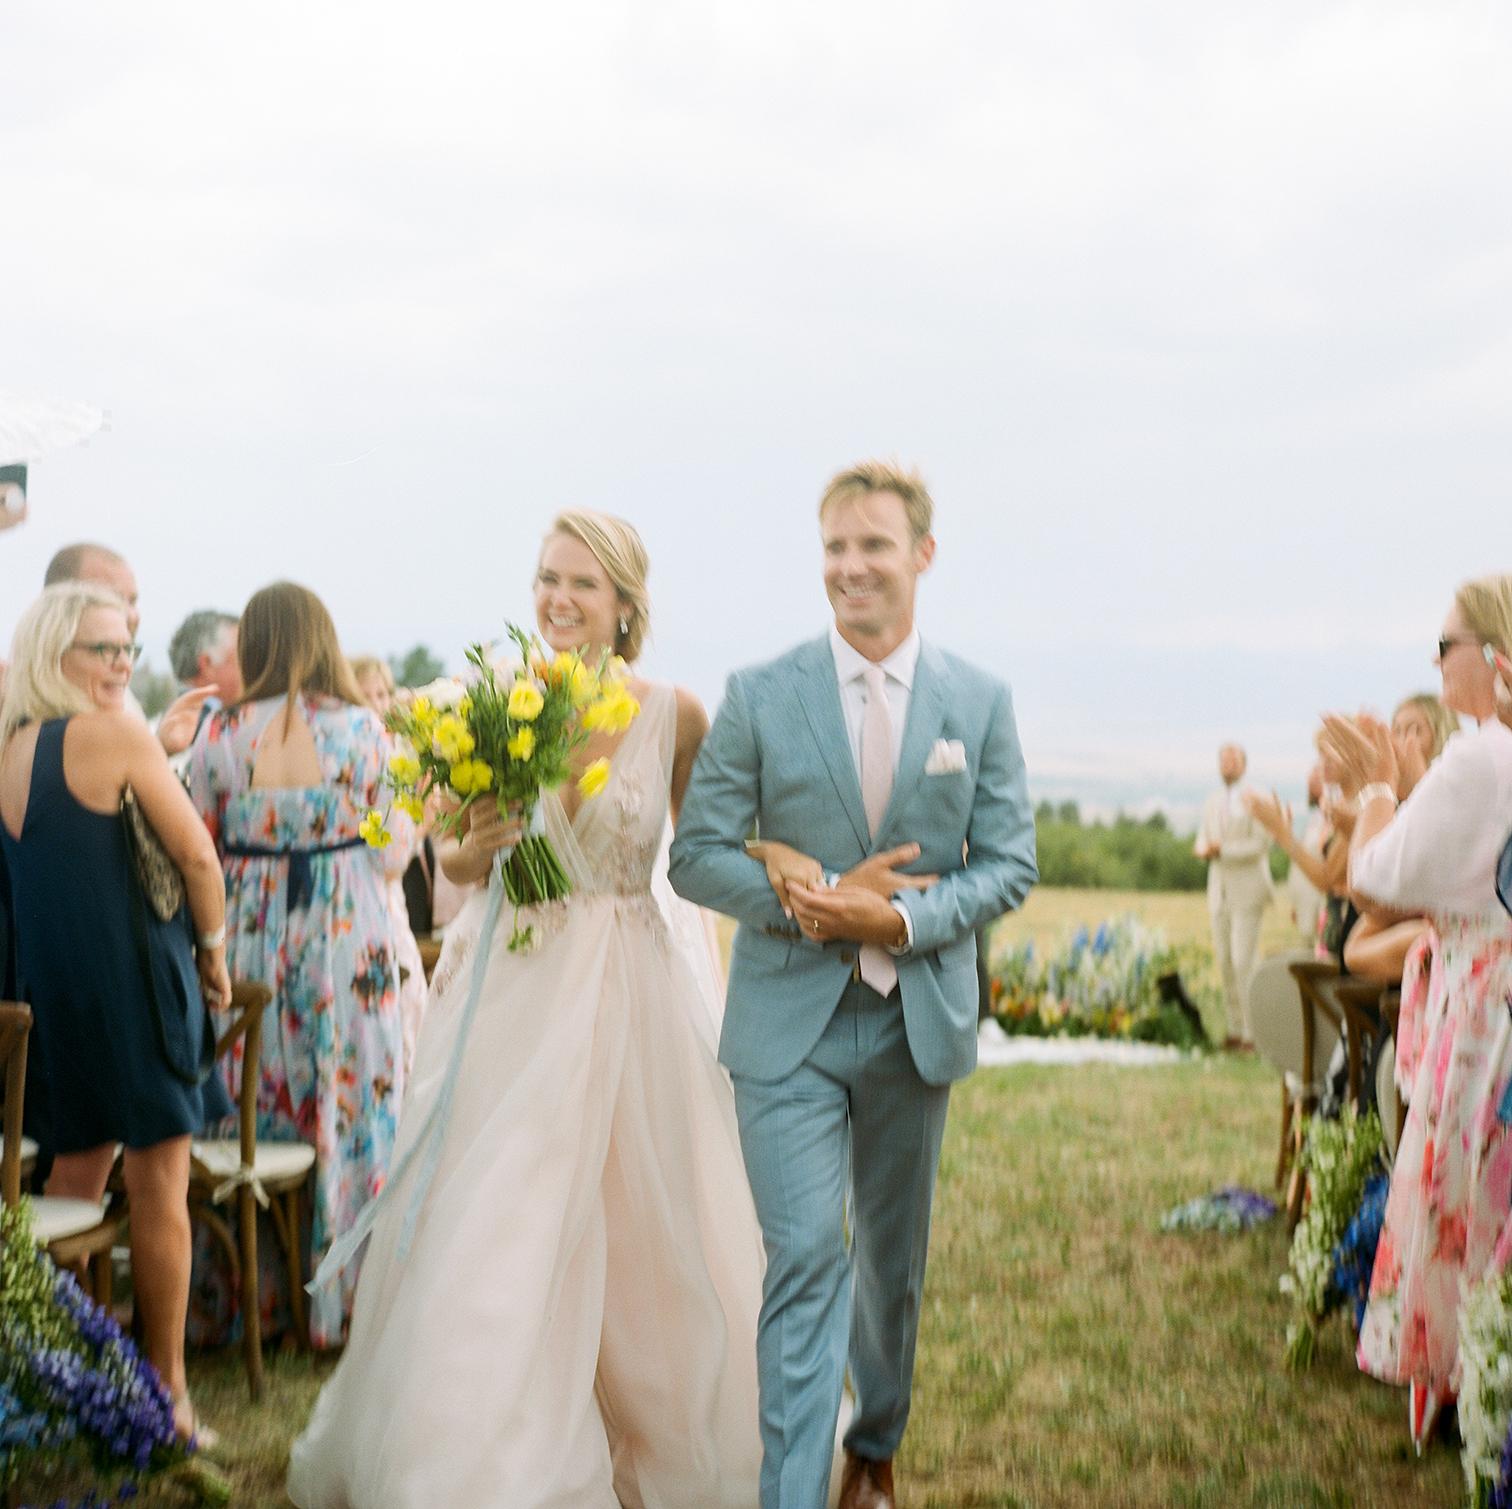 Colorado Wedding Photographers, Mountain Ceremonies, Bride and Groom Walking to Reception